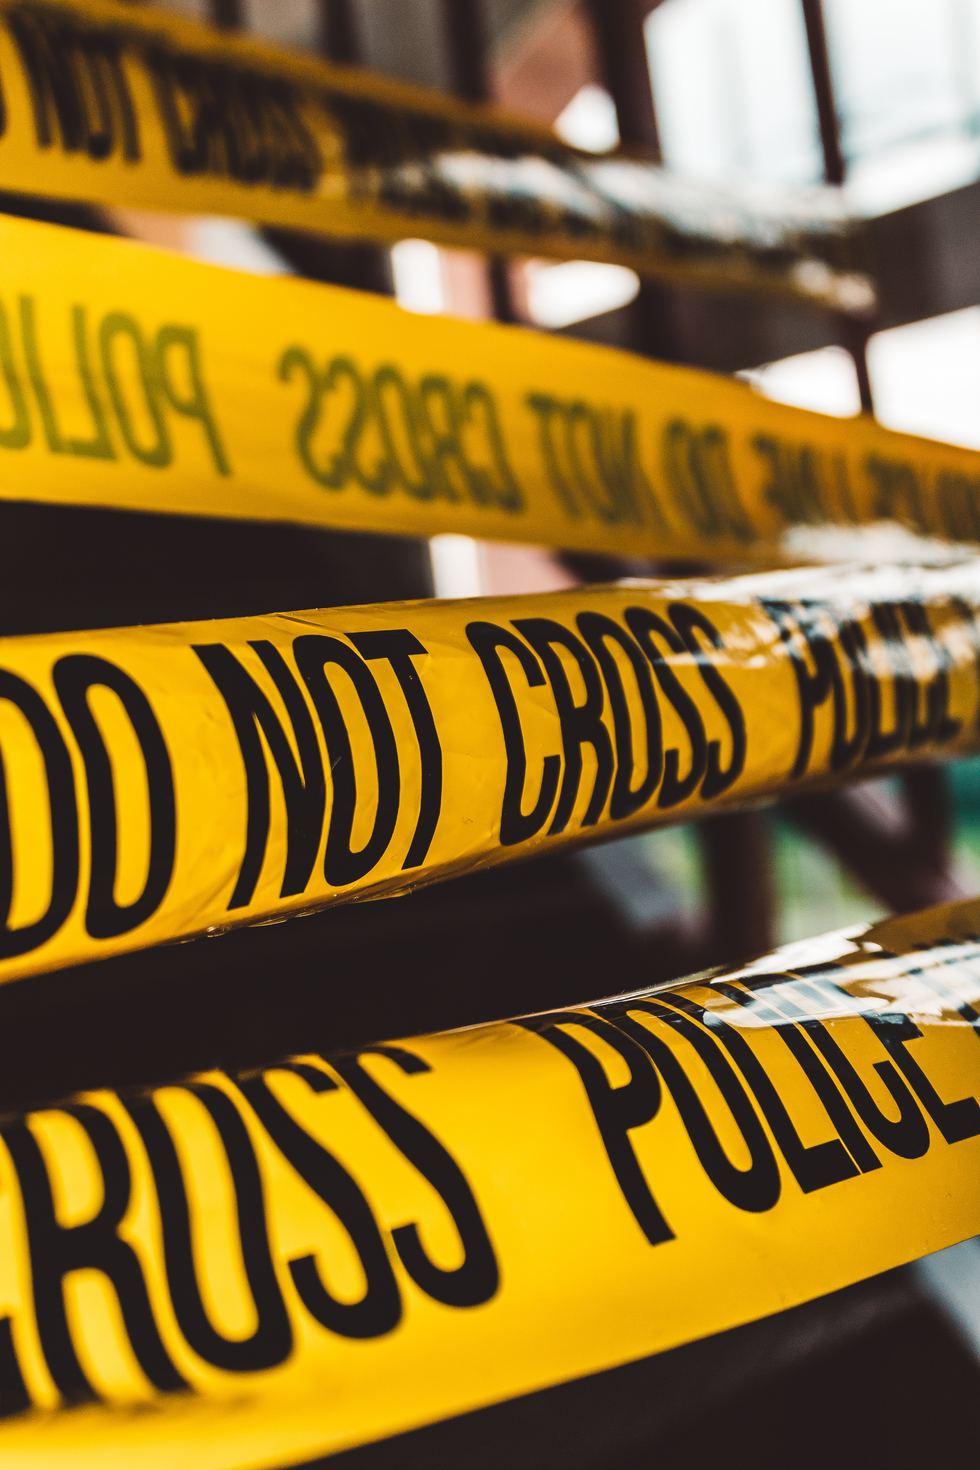 Wrongful death murder blog